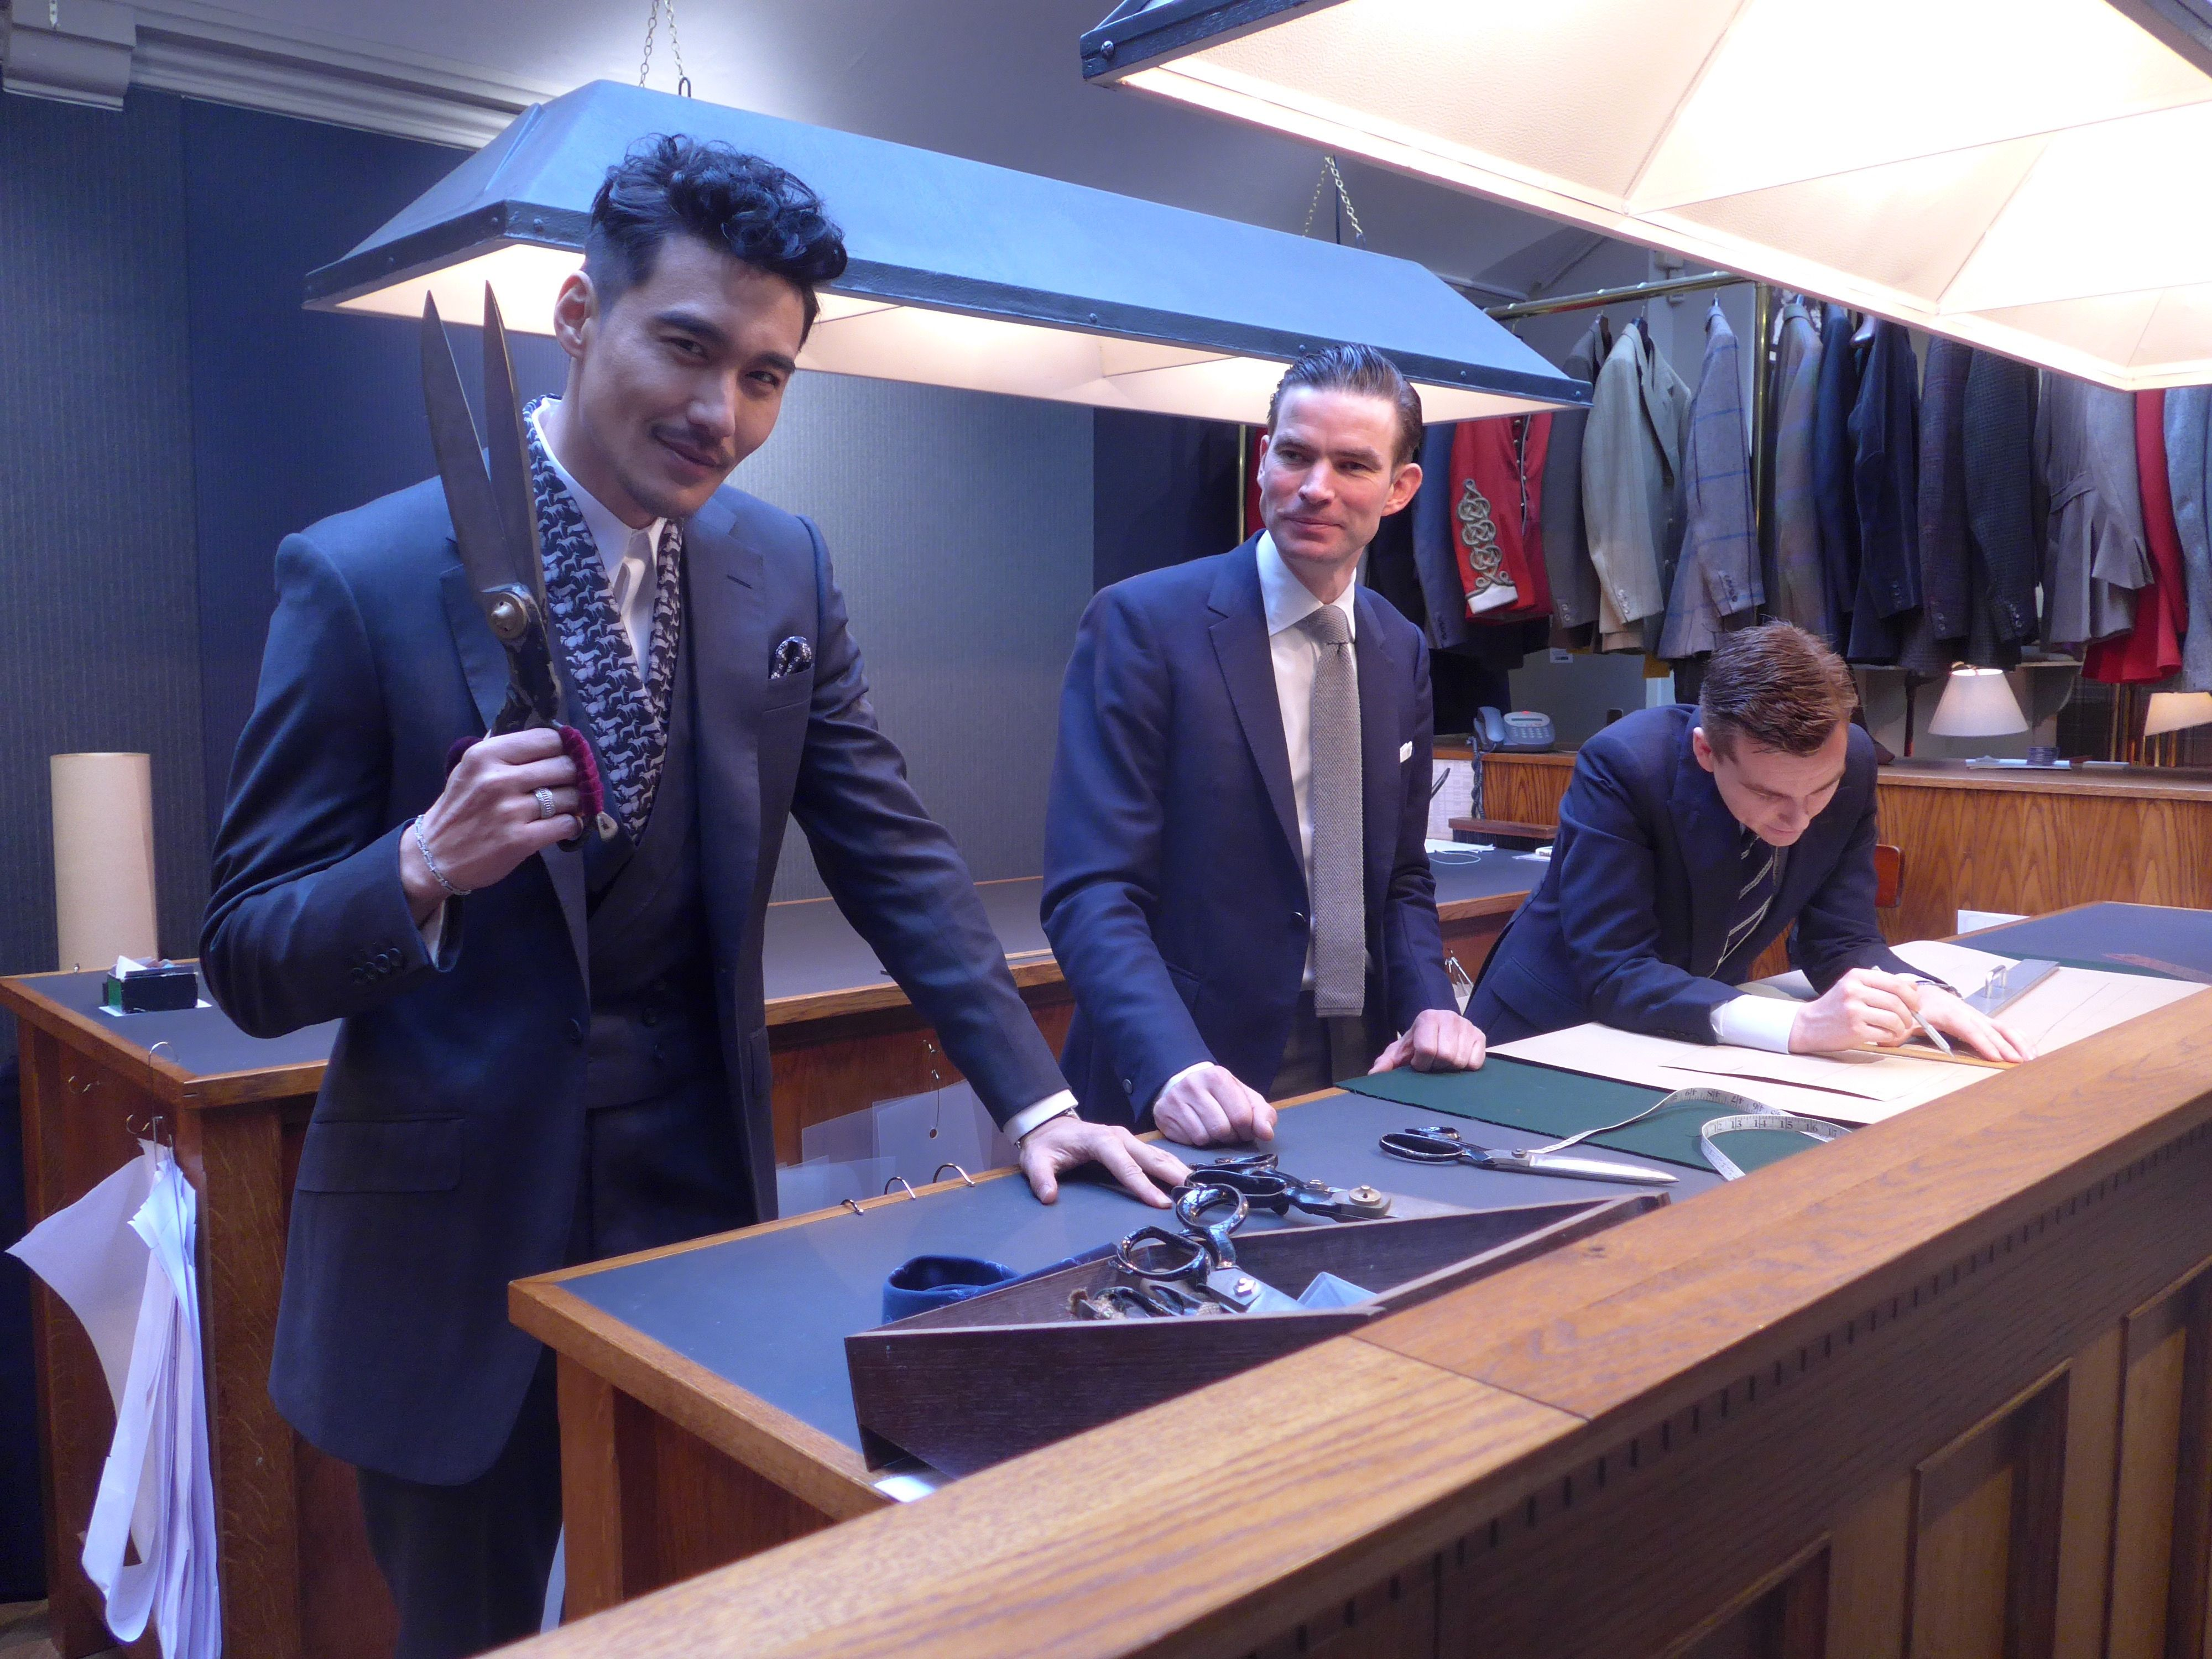 Hu Bing in in Huntsman | Fashionworldstuff-Online Fashion ...